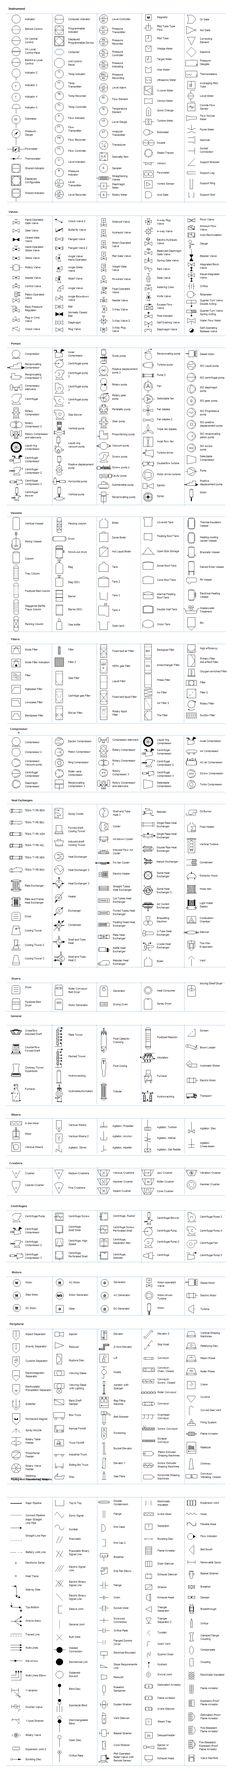 Schematic Symbols Chart | Electric Circuit Symbols: a considerably ...